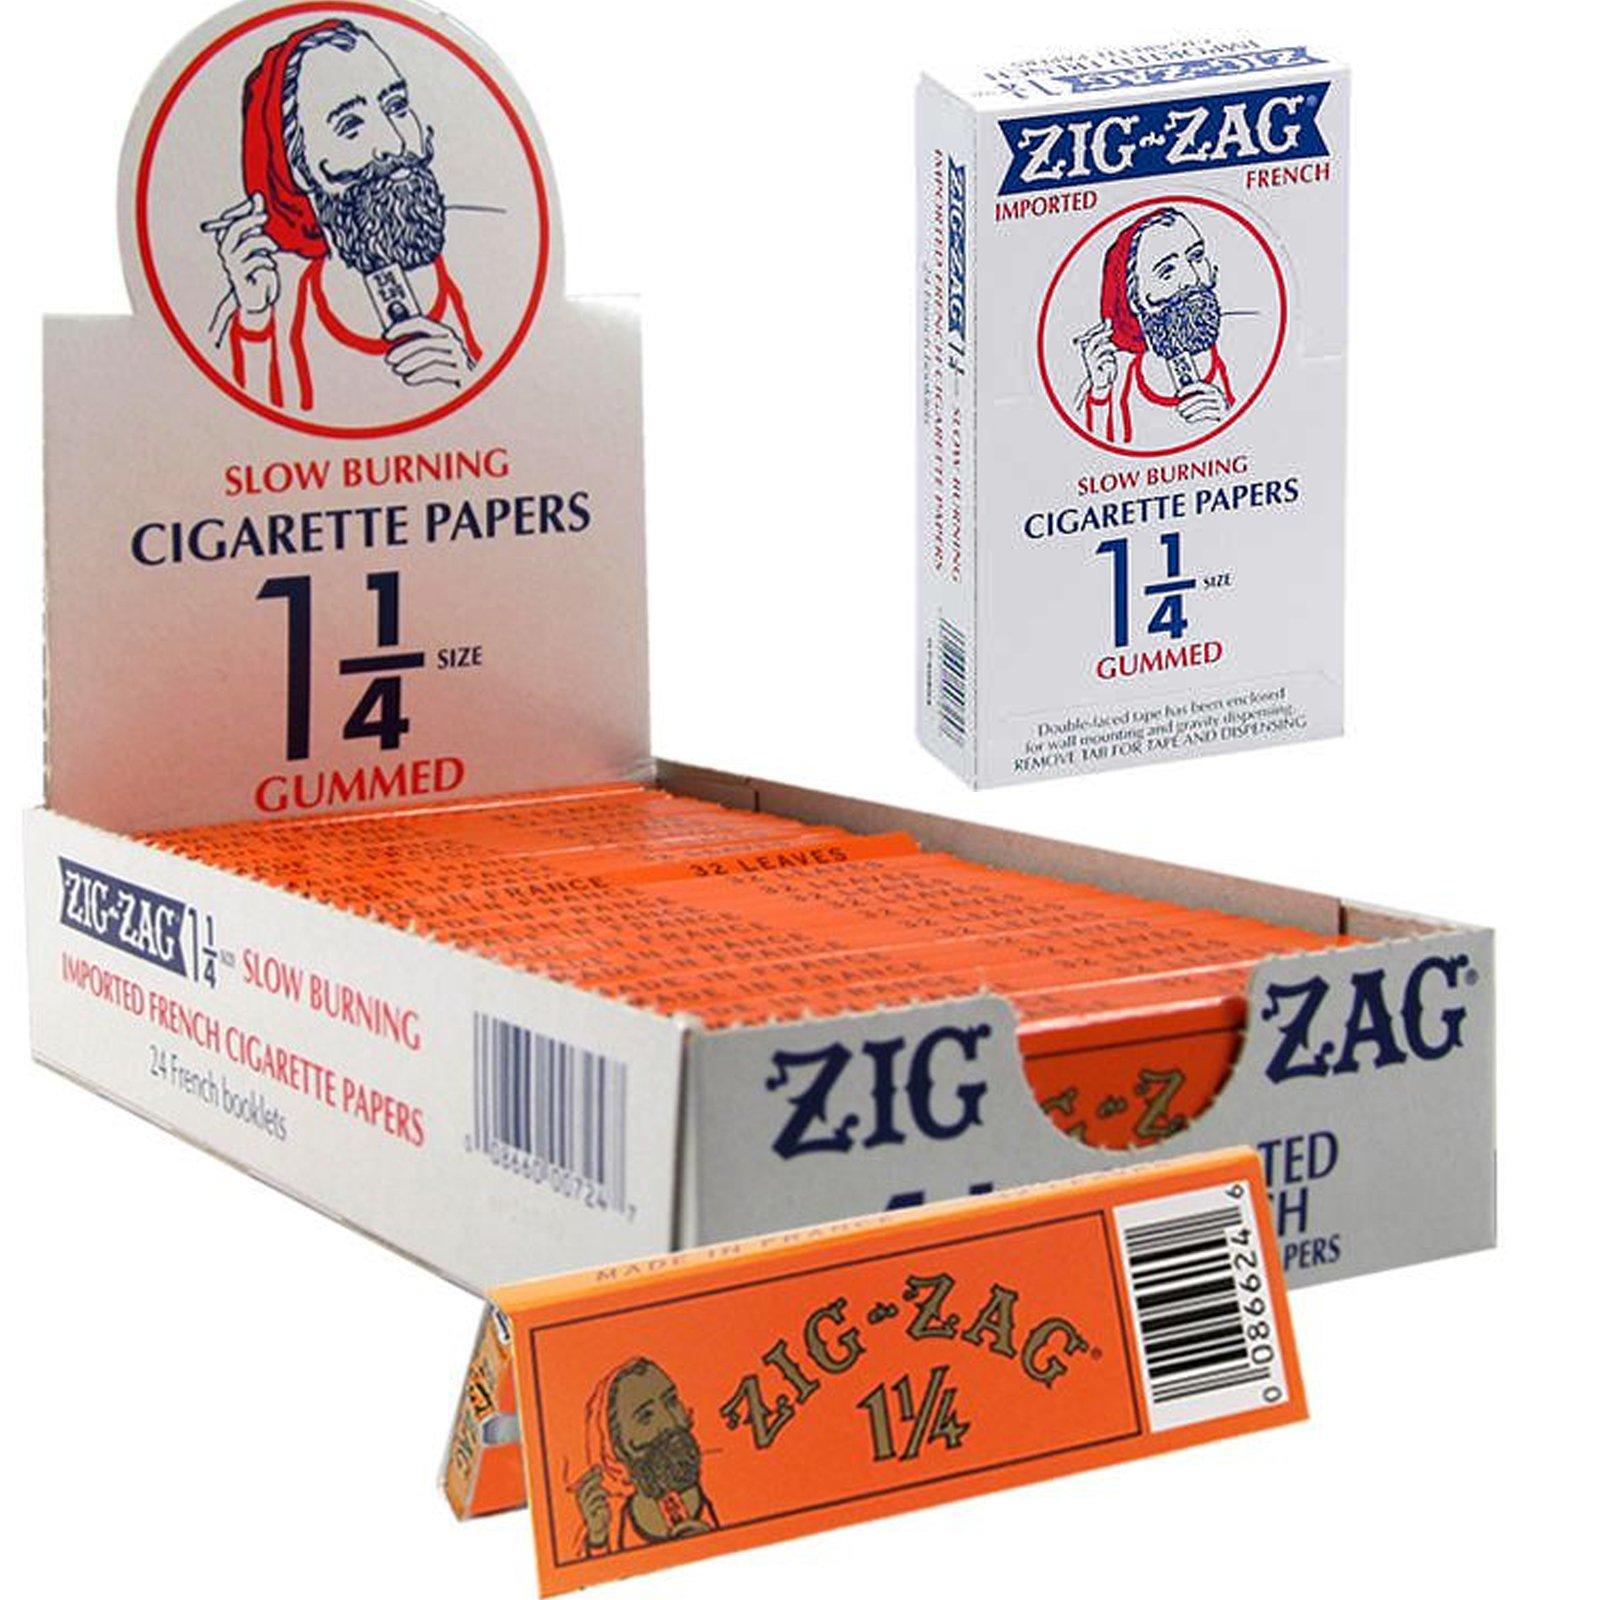 Full Box Zig Zag Cigarette Rolling Paper RYO 1.25 1 1/4 Gummed Orange Paper 24 Booklets